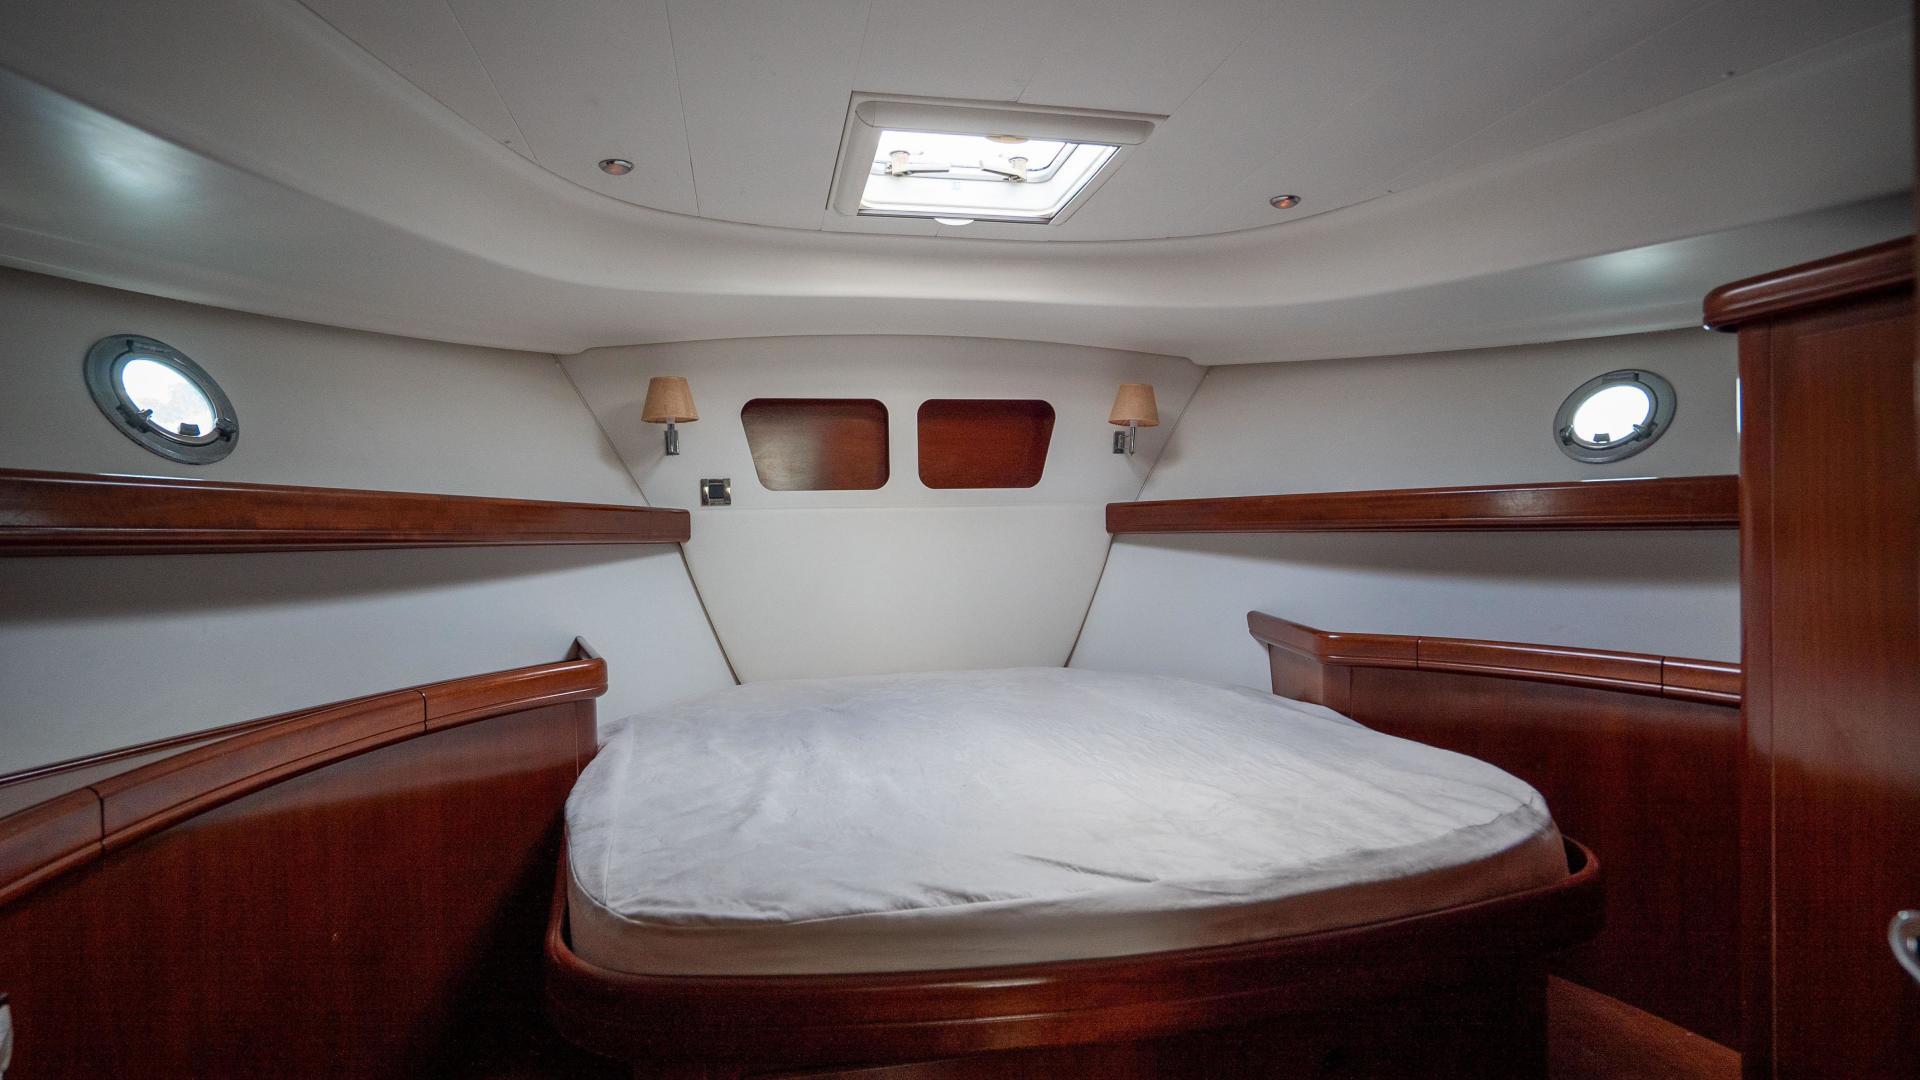 Beneteau-Swift Trawler 2008-Amadeus Acapulco-Mexico-1487088 | Thumbnail